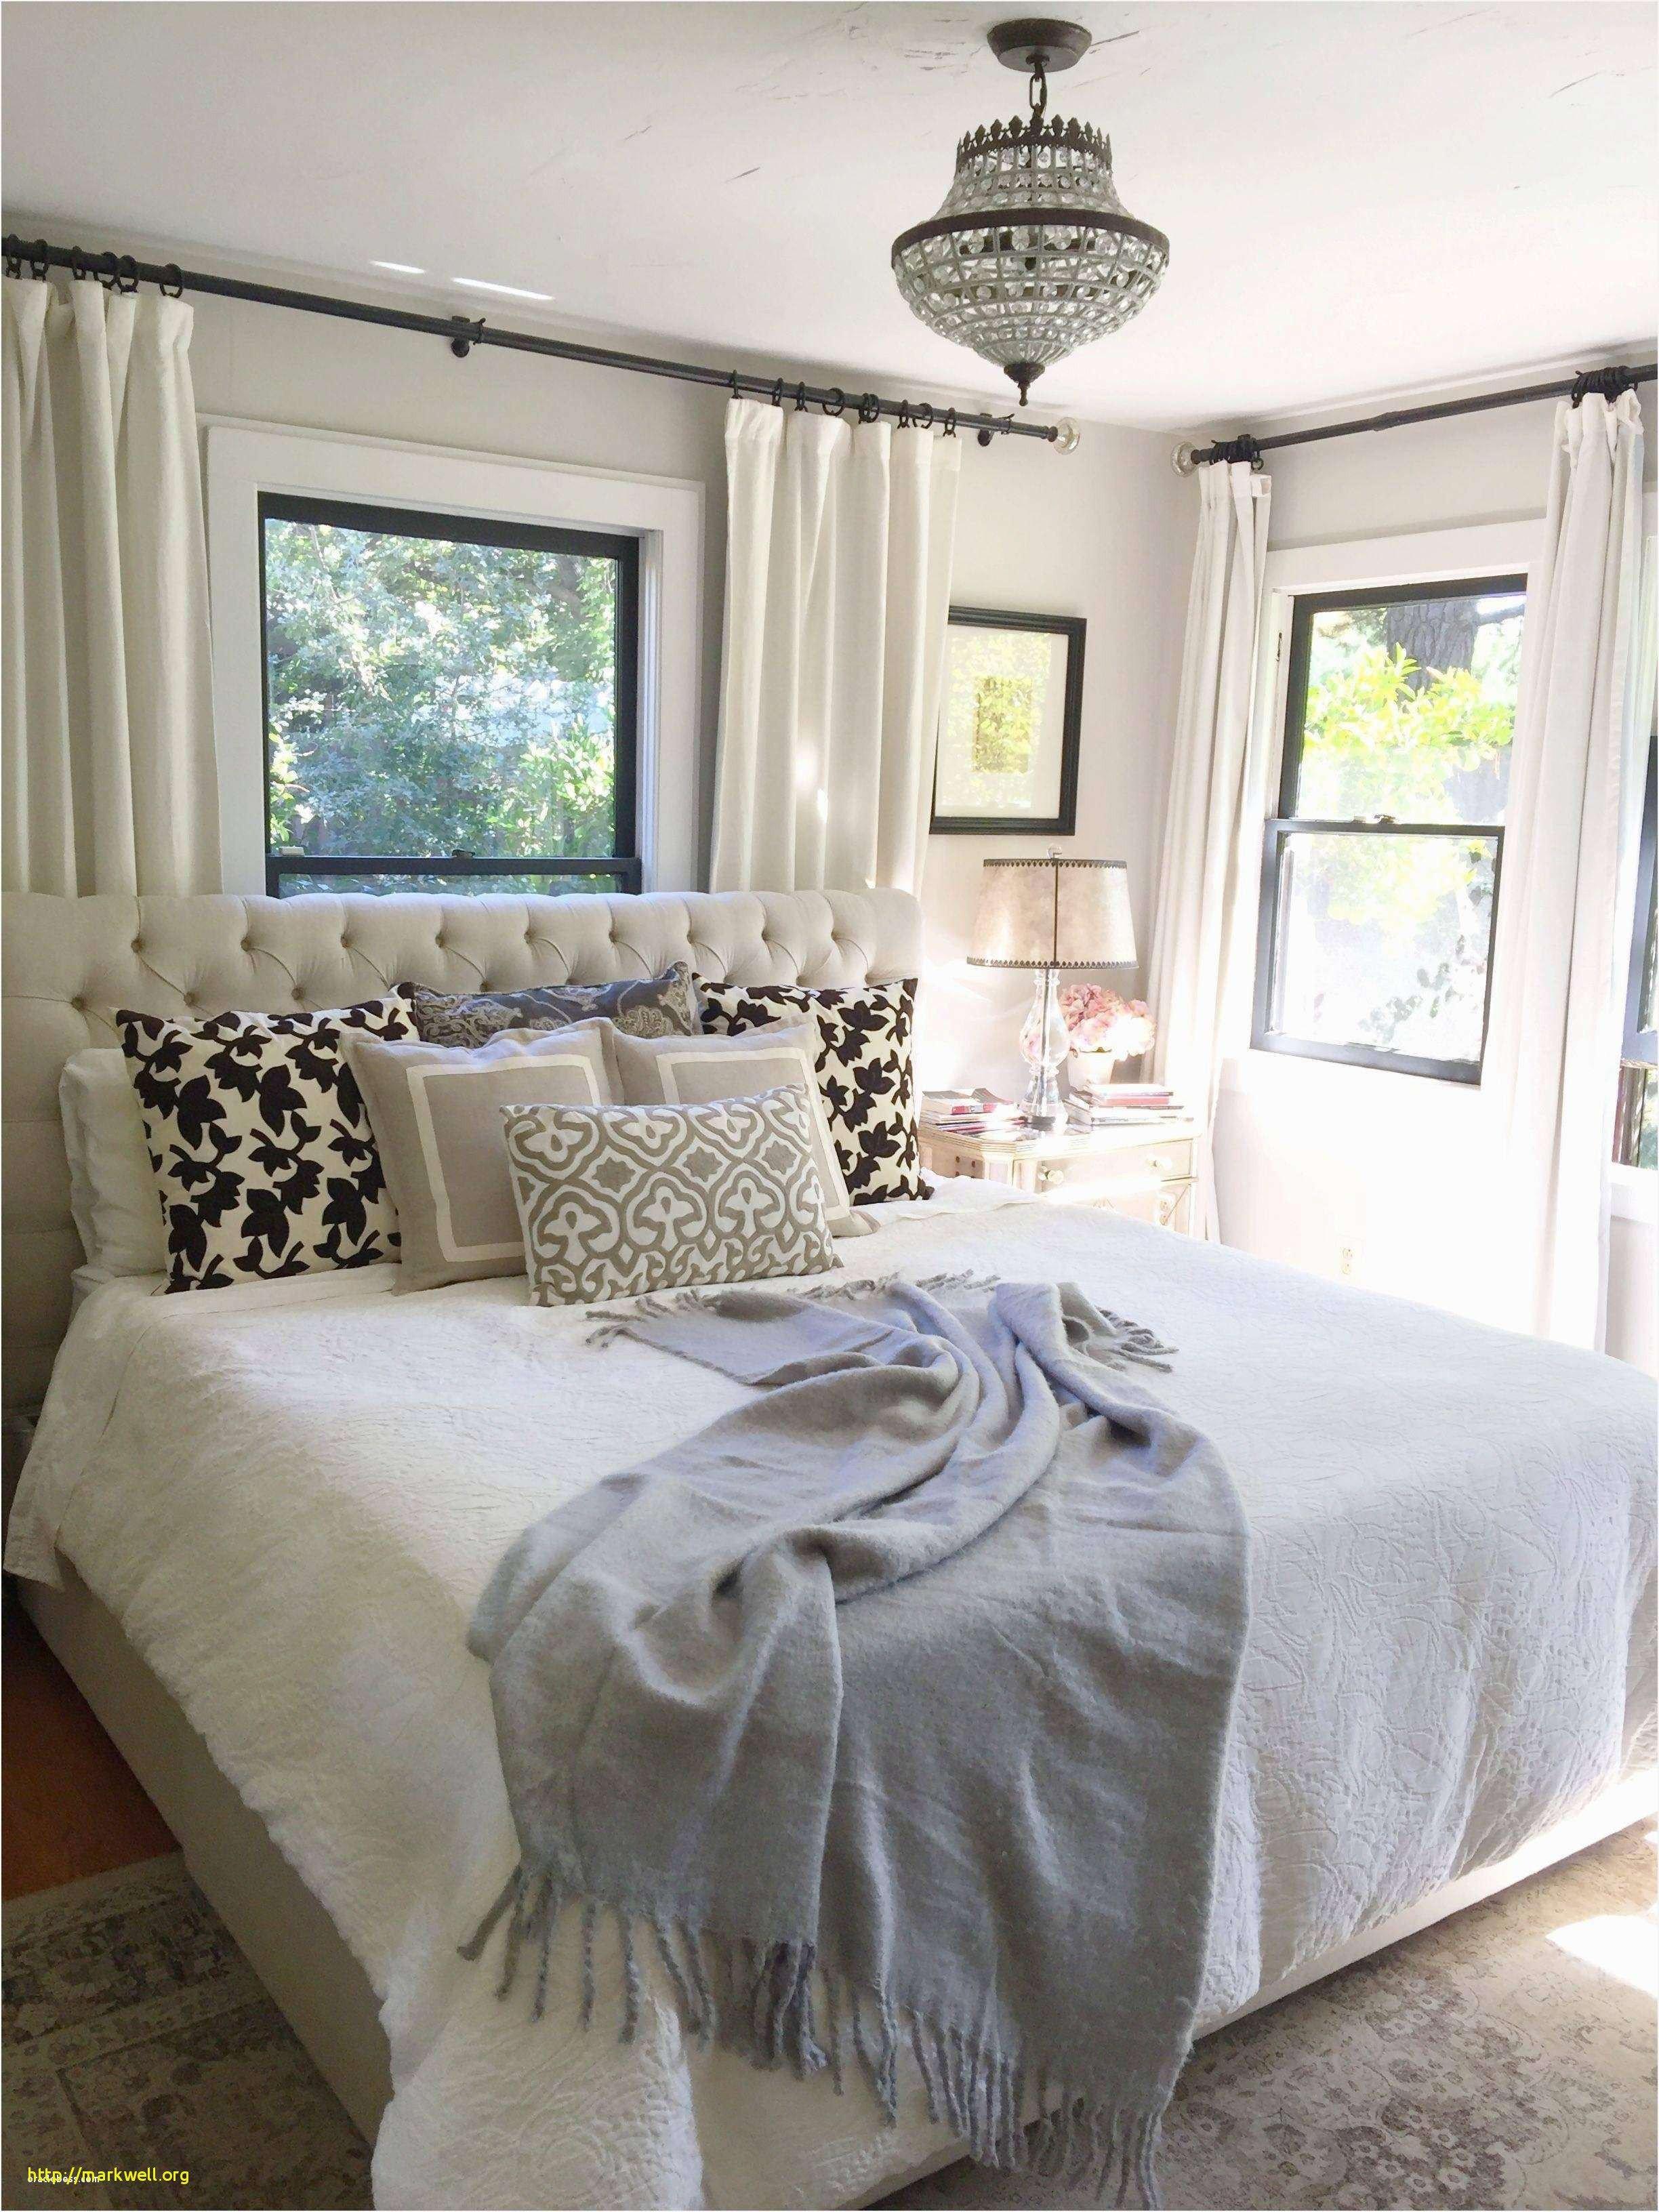 white bedroom chair best of white bedroom furniture new gold bedroom ideas elegant grey gold of white bedroom chair